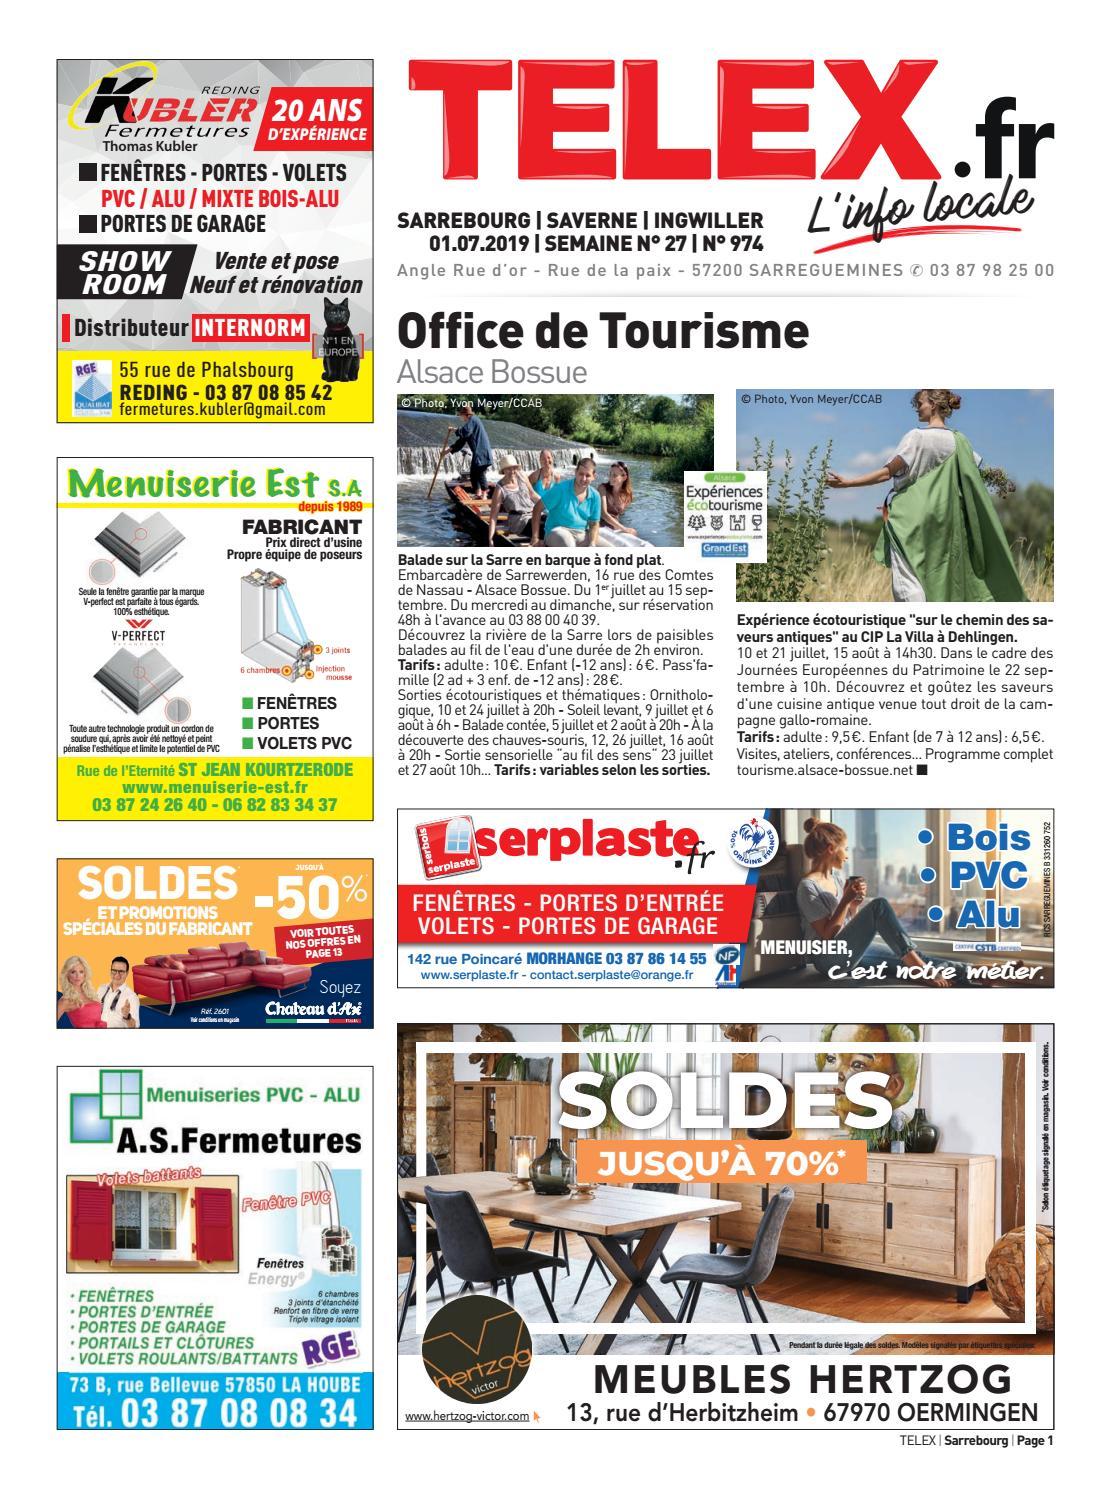 Tapis Pour Caravane Gitan 2719 sarrebourgclaude vervin - issuu